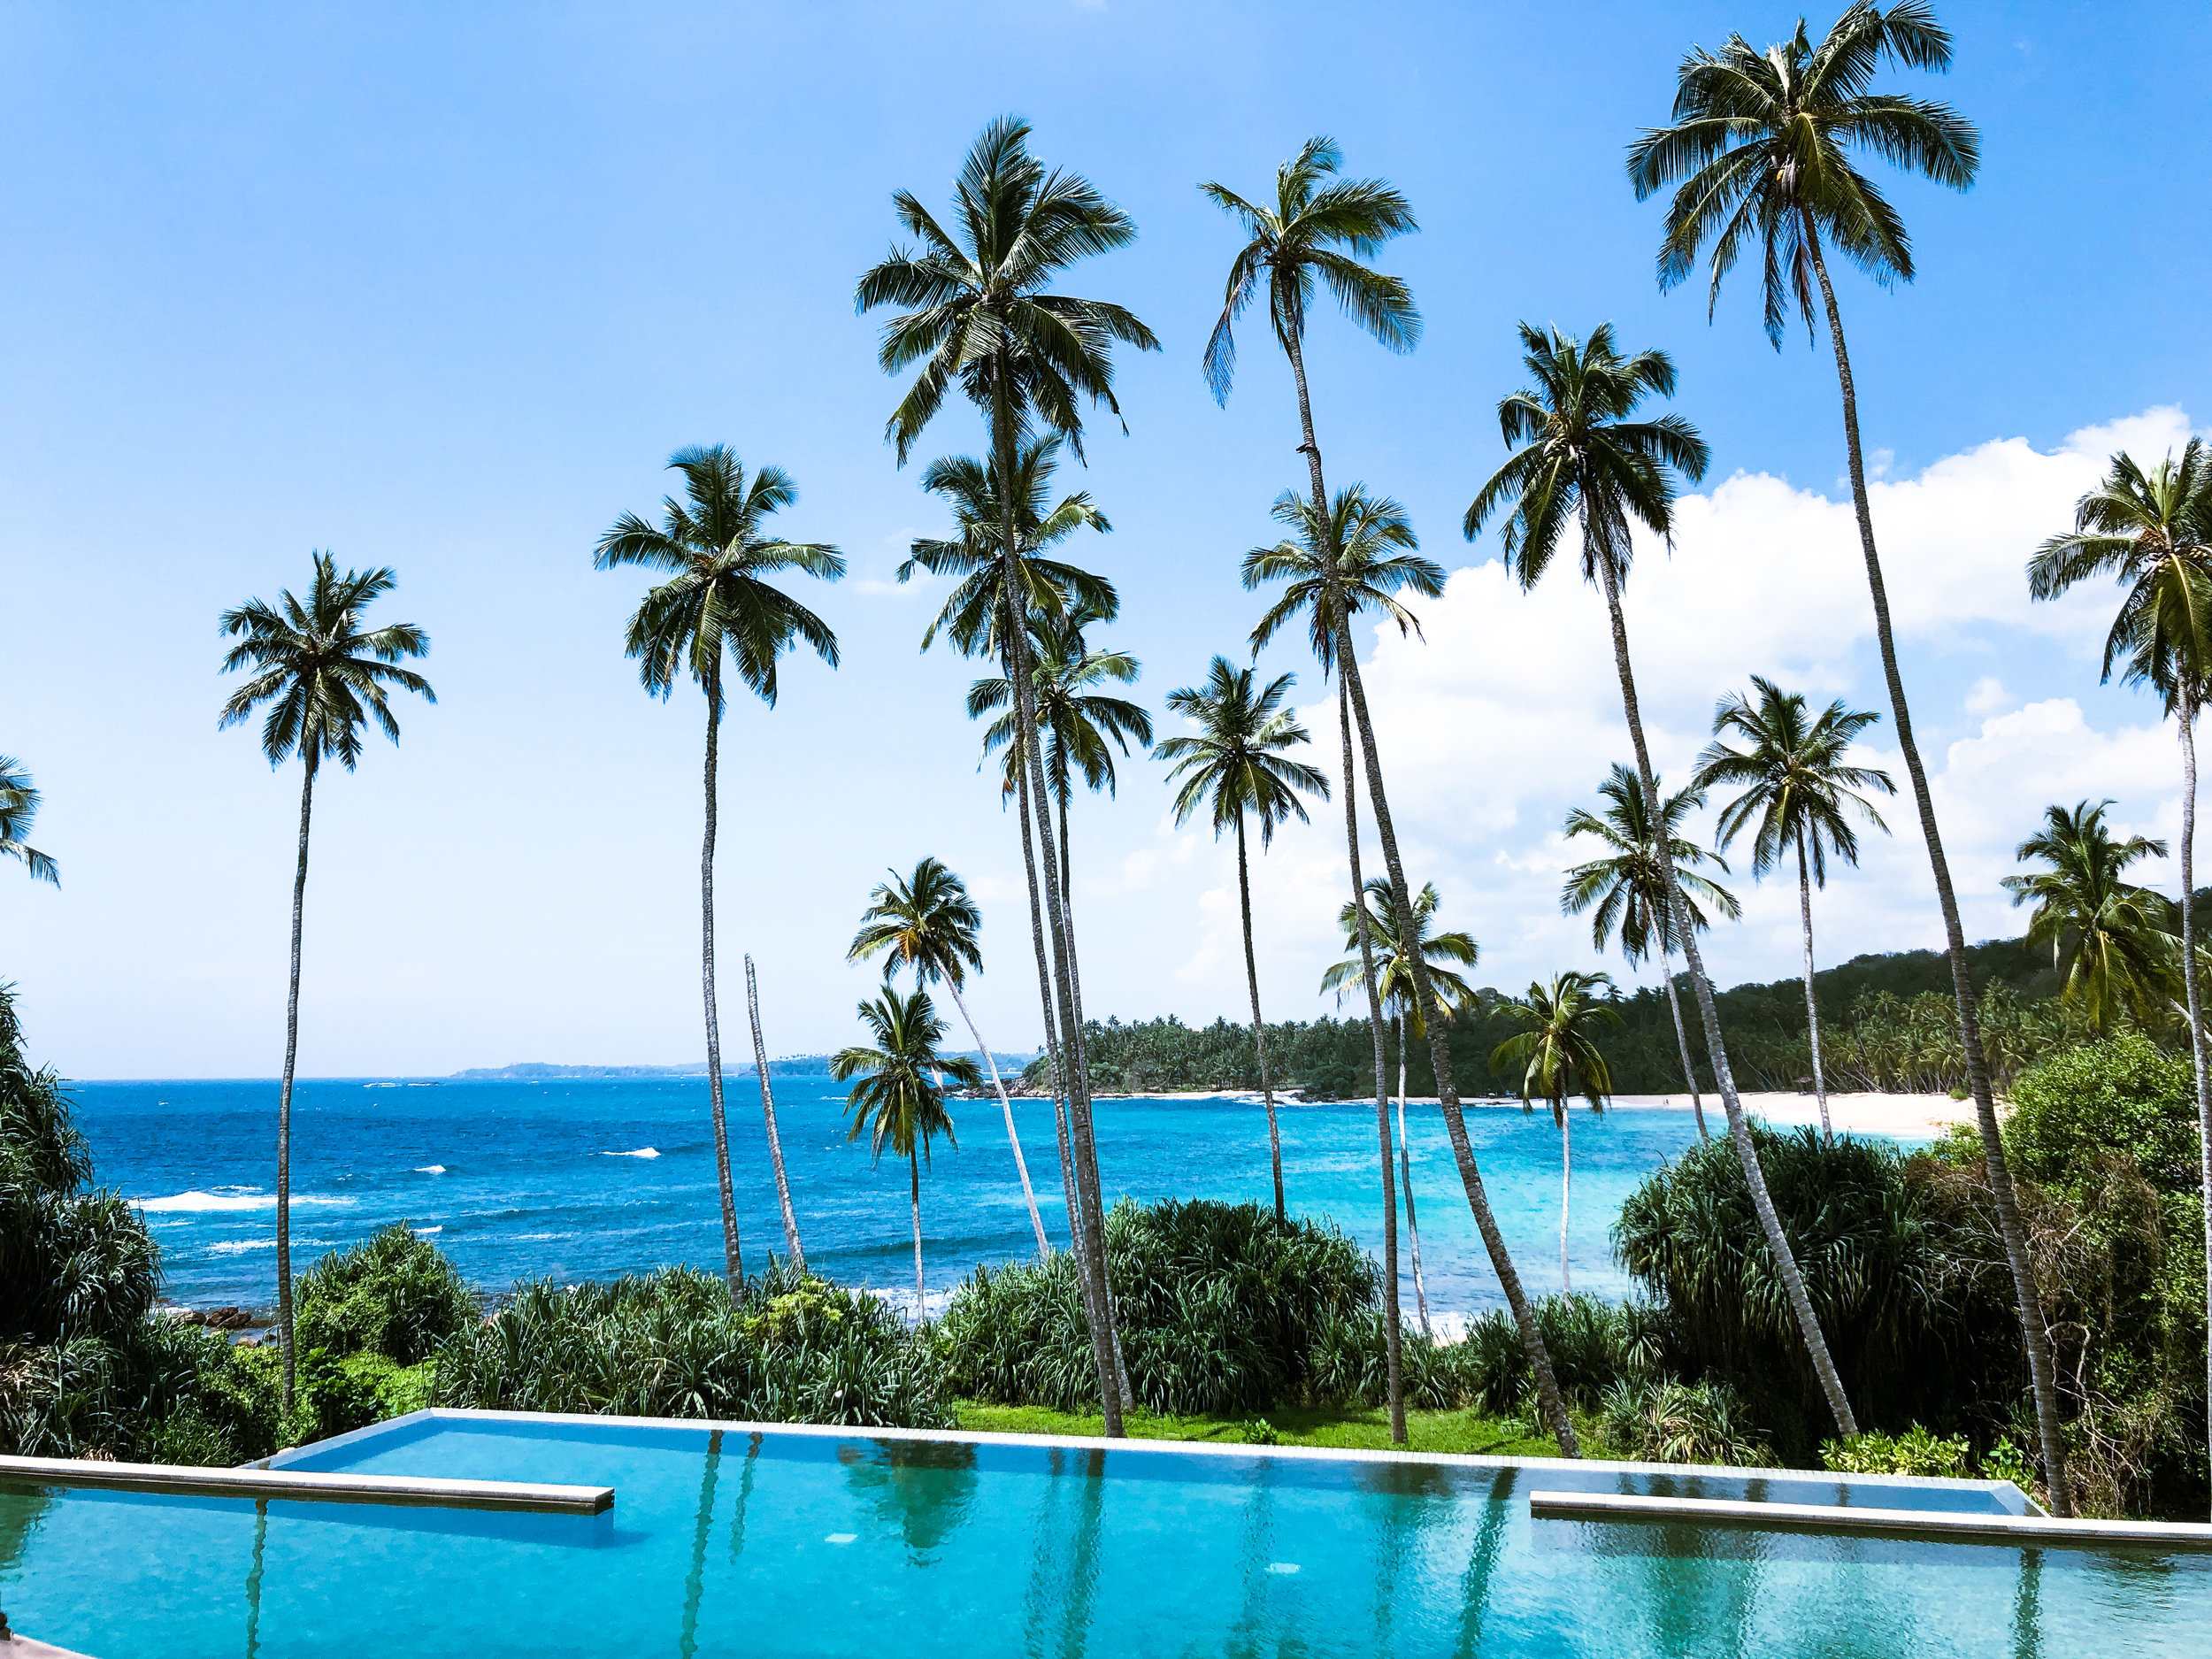 Amanwella Resort